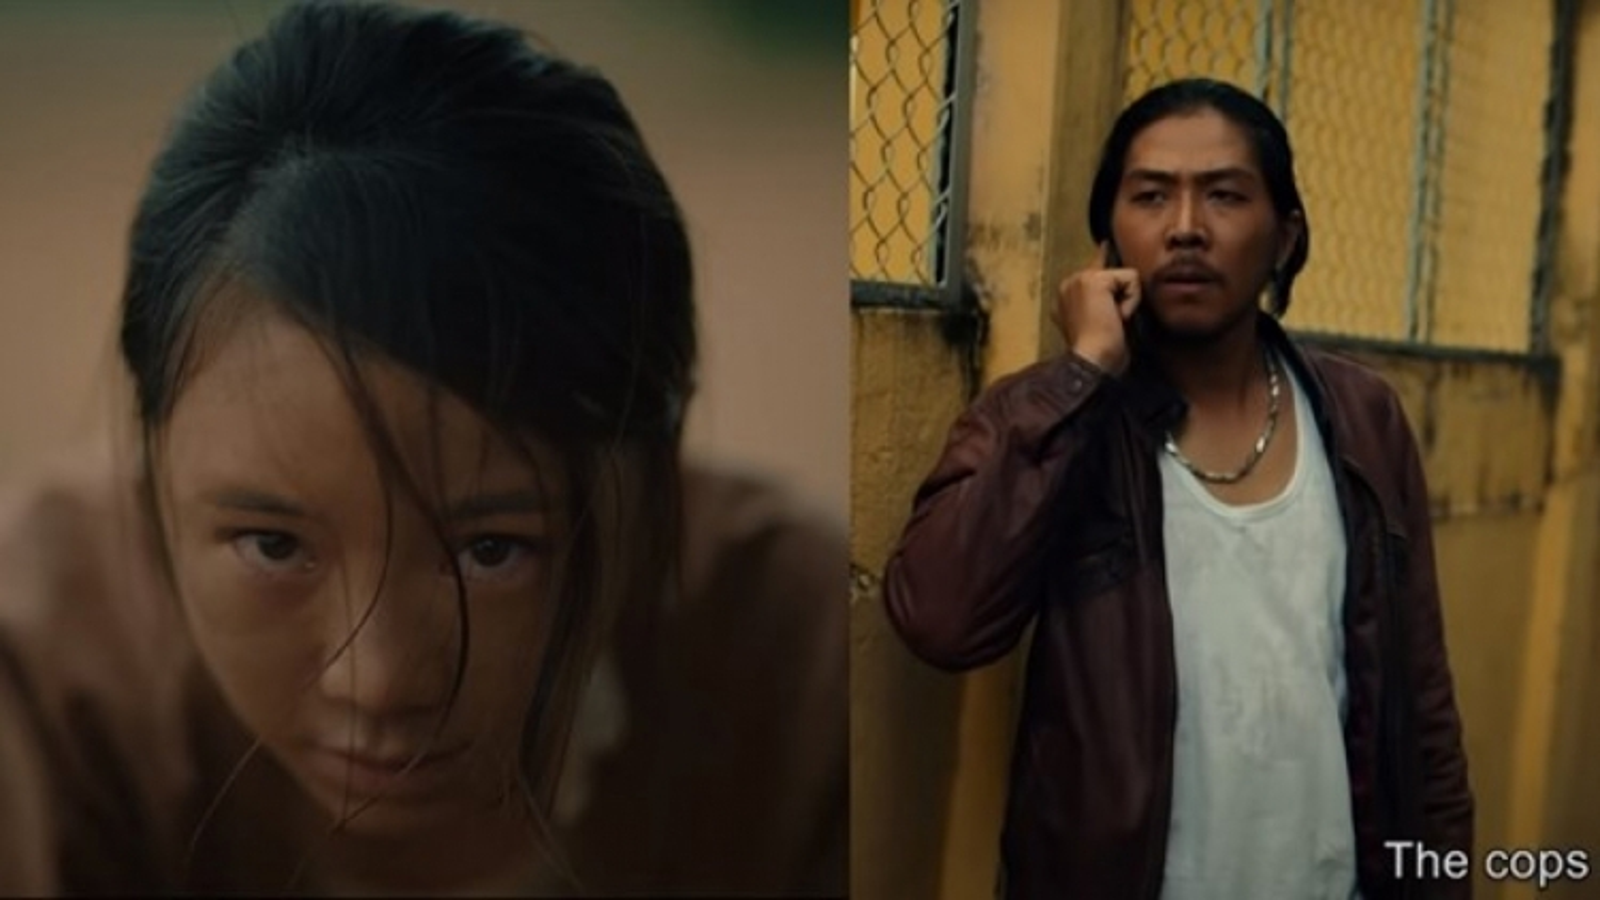 Two Vietnamese short films participate in L.A. Shorts Int'l Film Fest